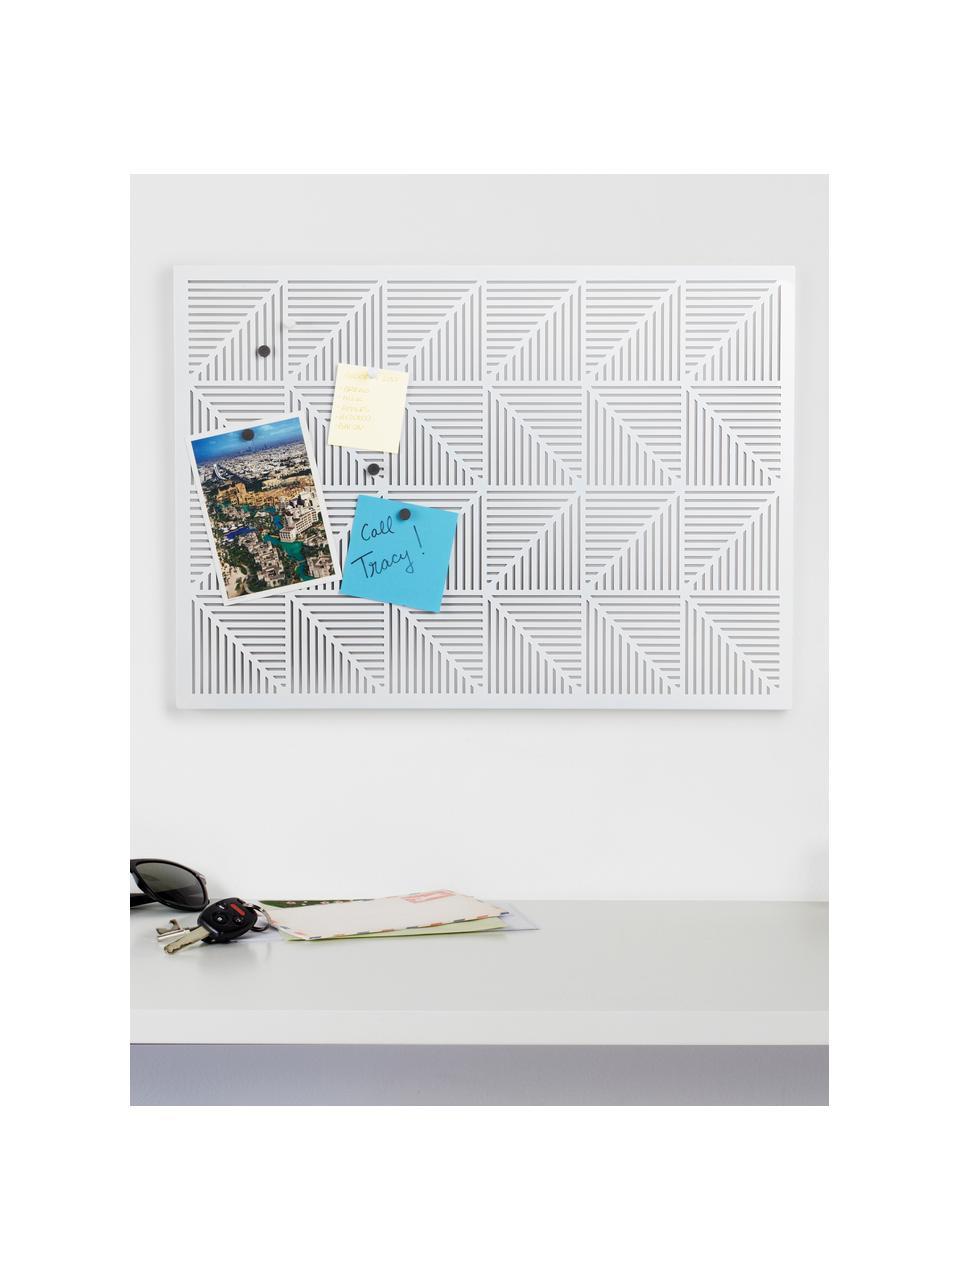 Prikbord Trigon, Metaal, sponsrubber, Wit, 53 x 38 cm